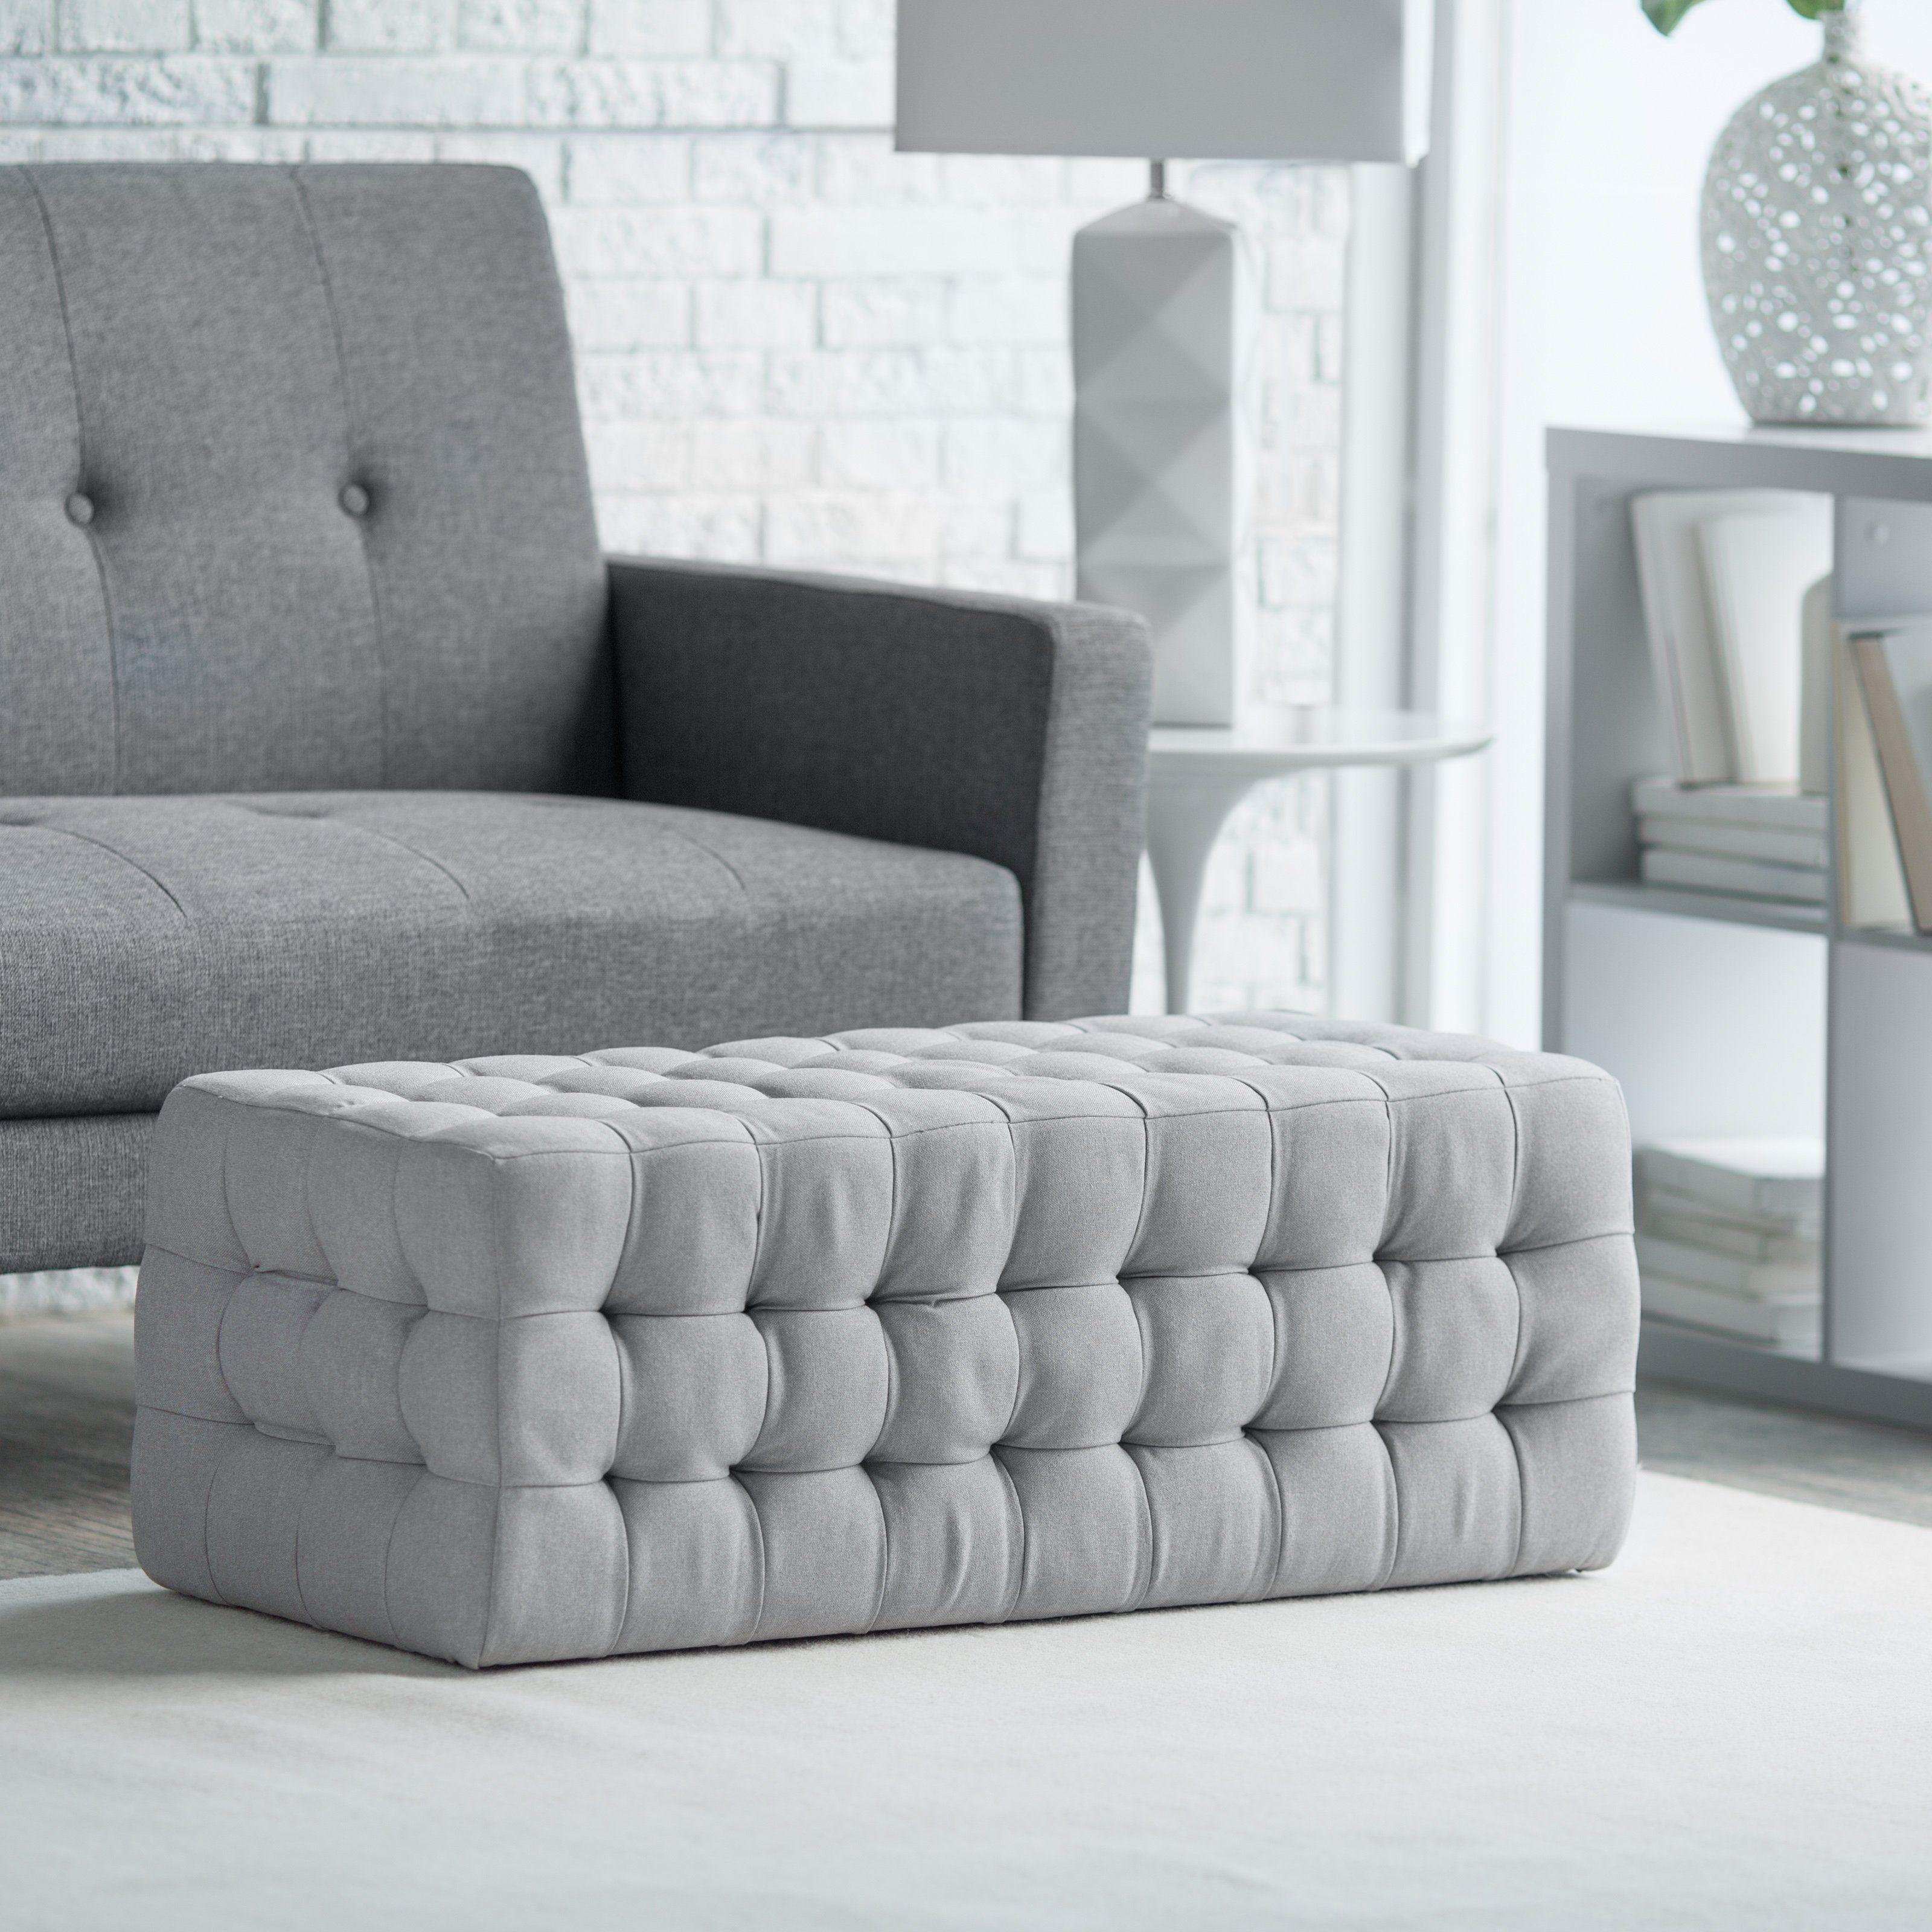 Belham Living Allover Tufted Rectangle Ottoman - Grey | from ...